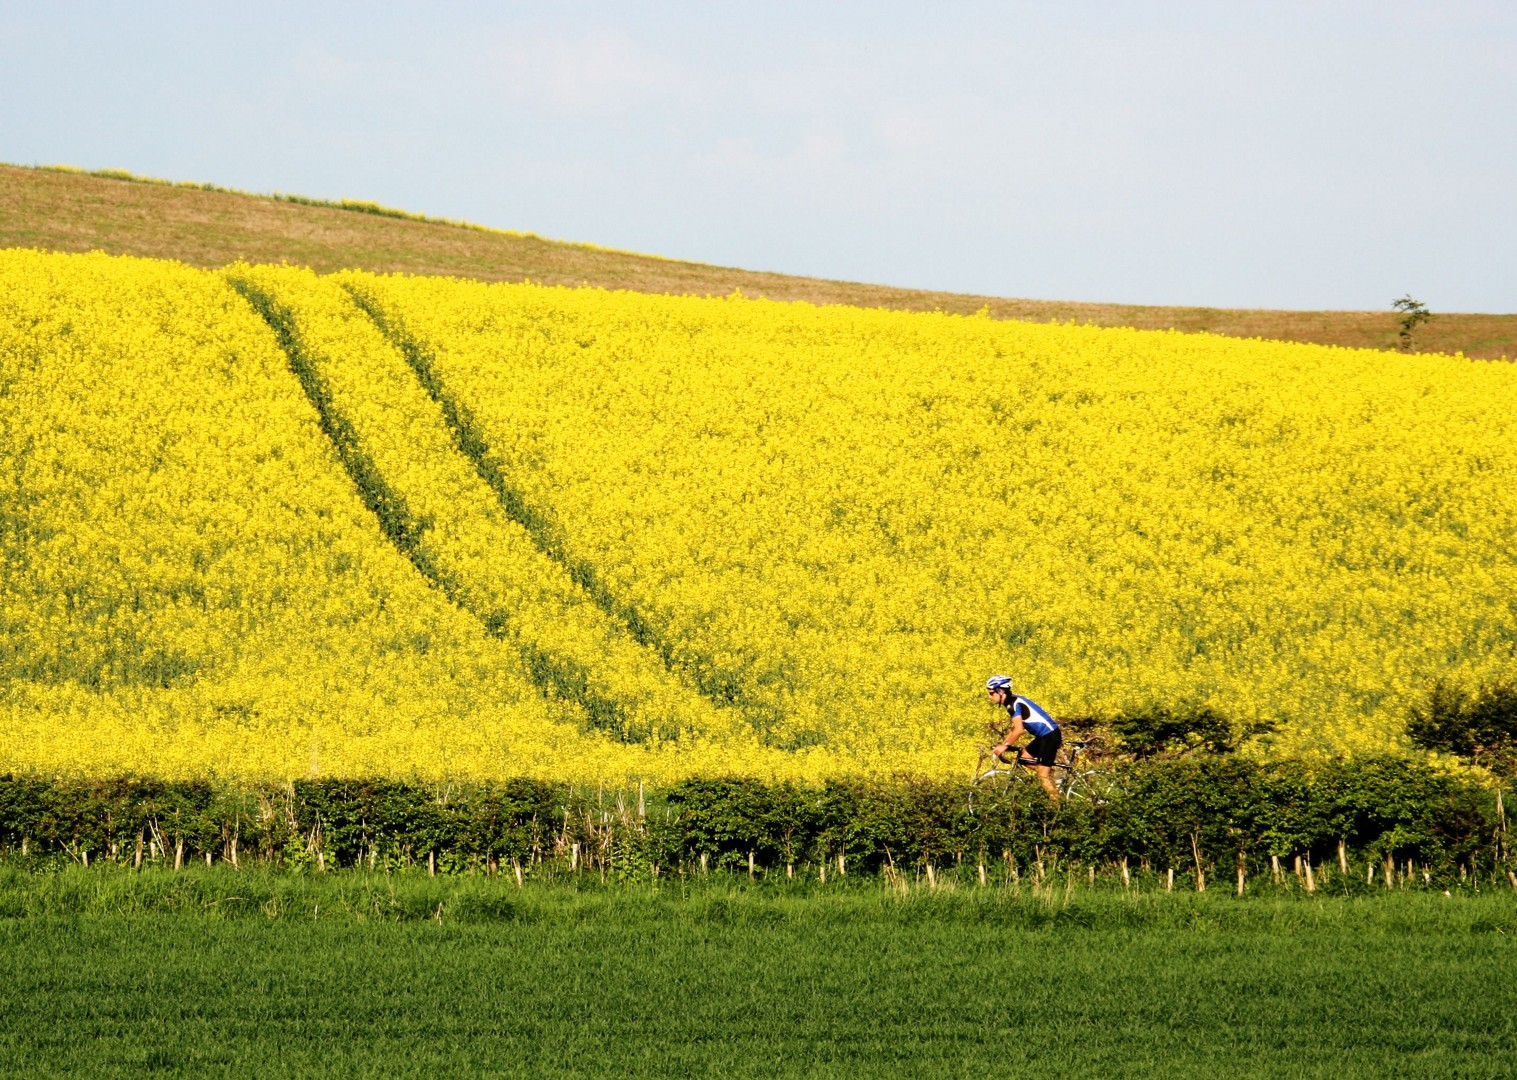 uk-northumberland-cycling-weekend.jpg - UK - Northumberland - Road Cycling